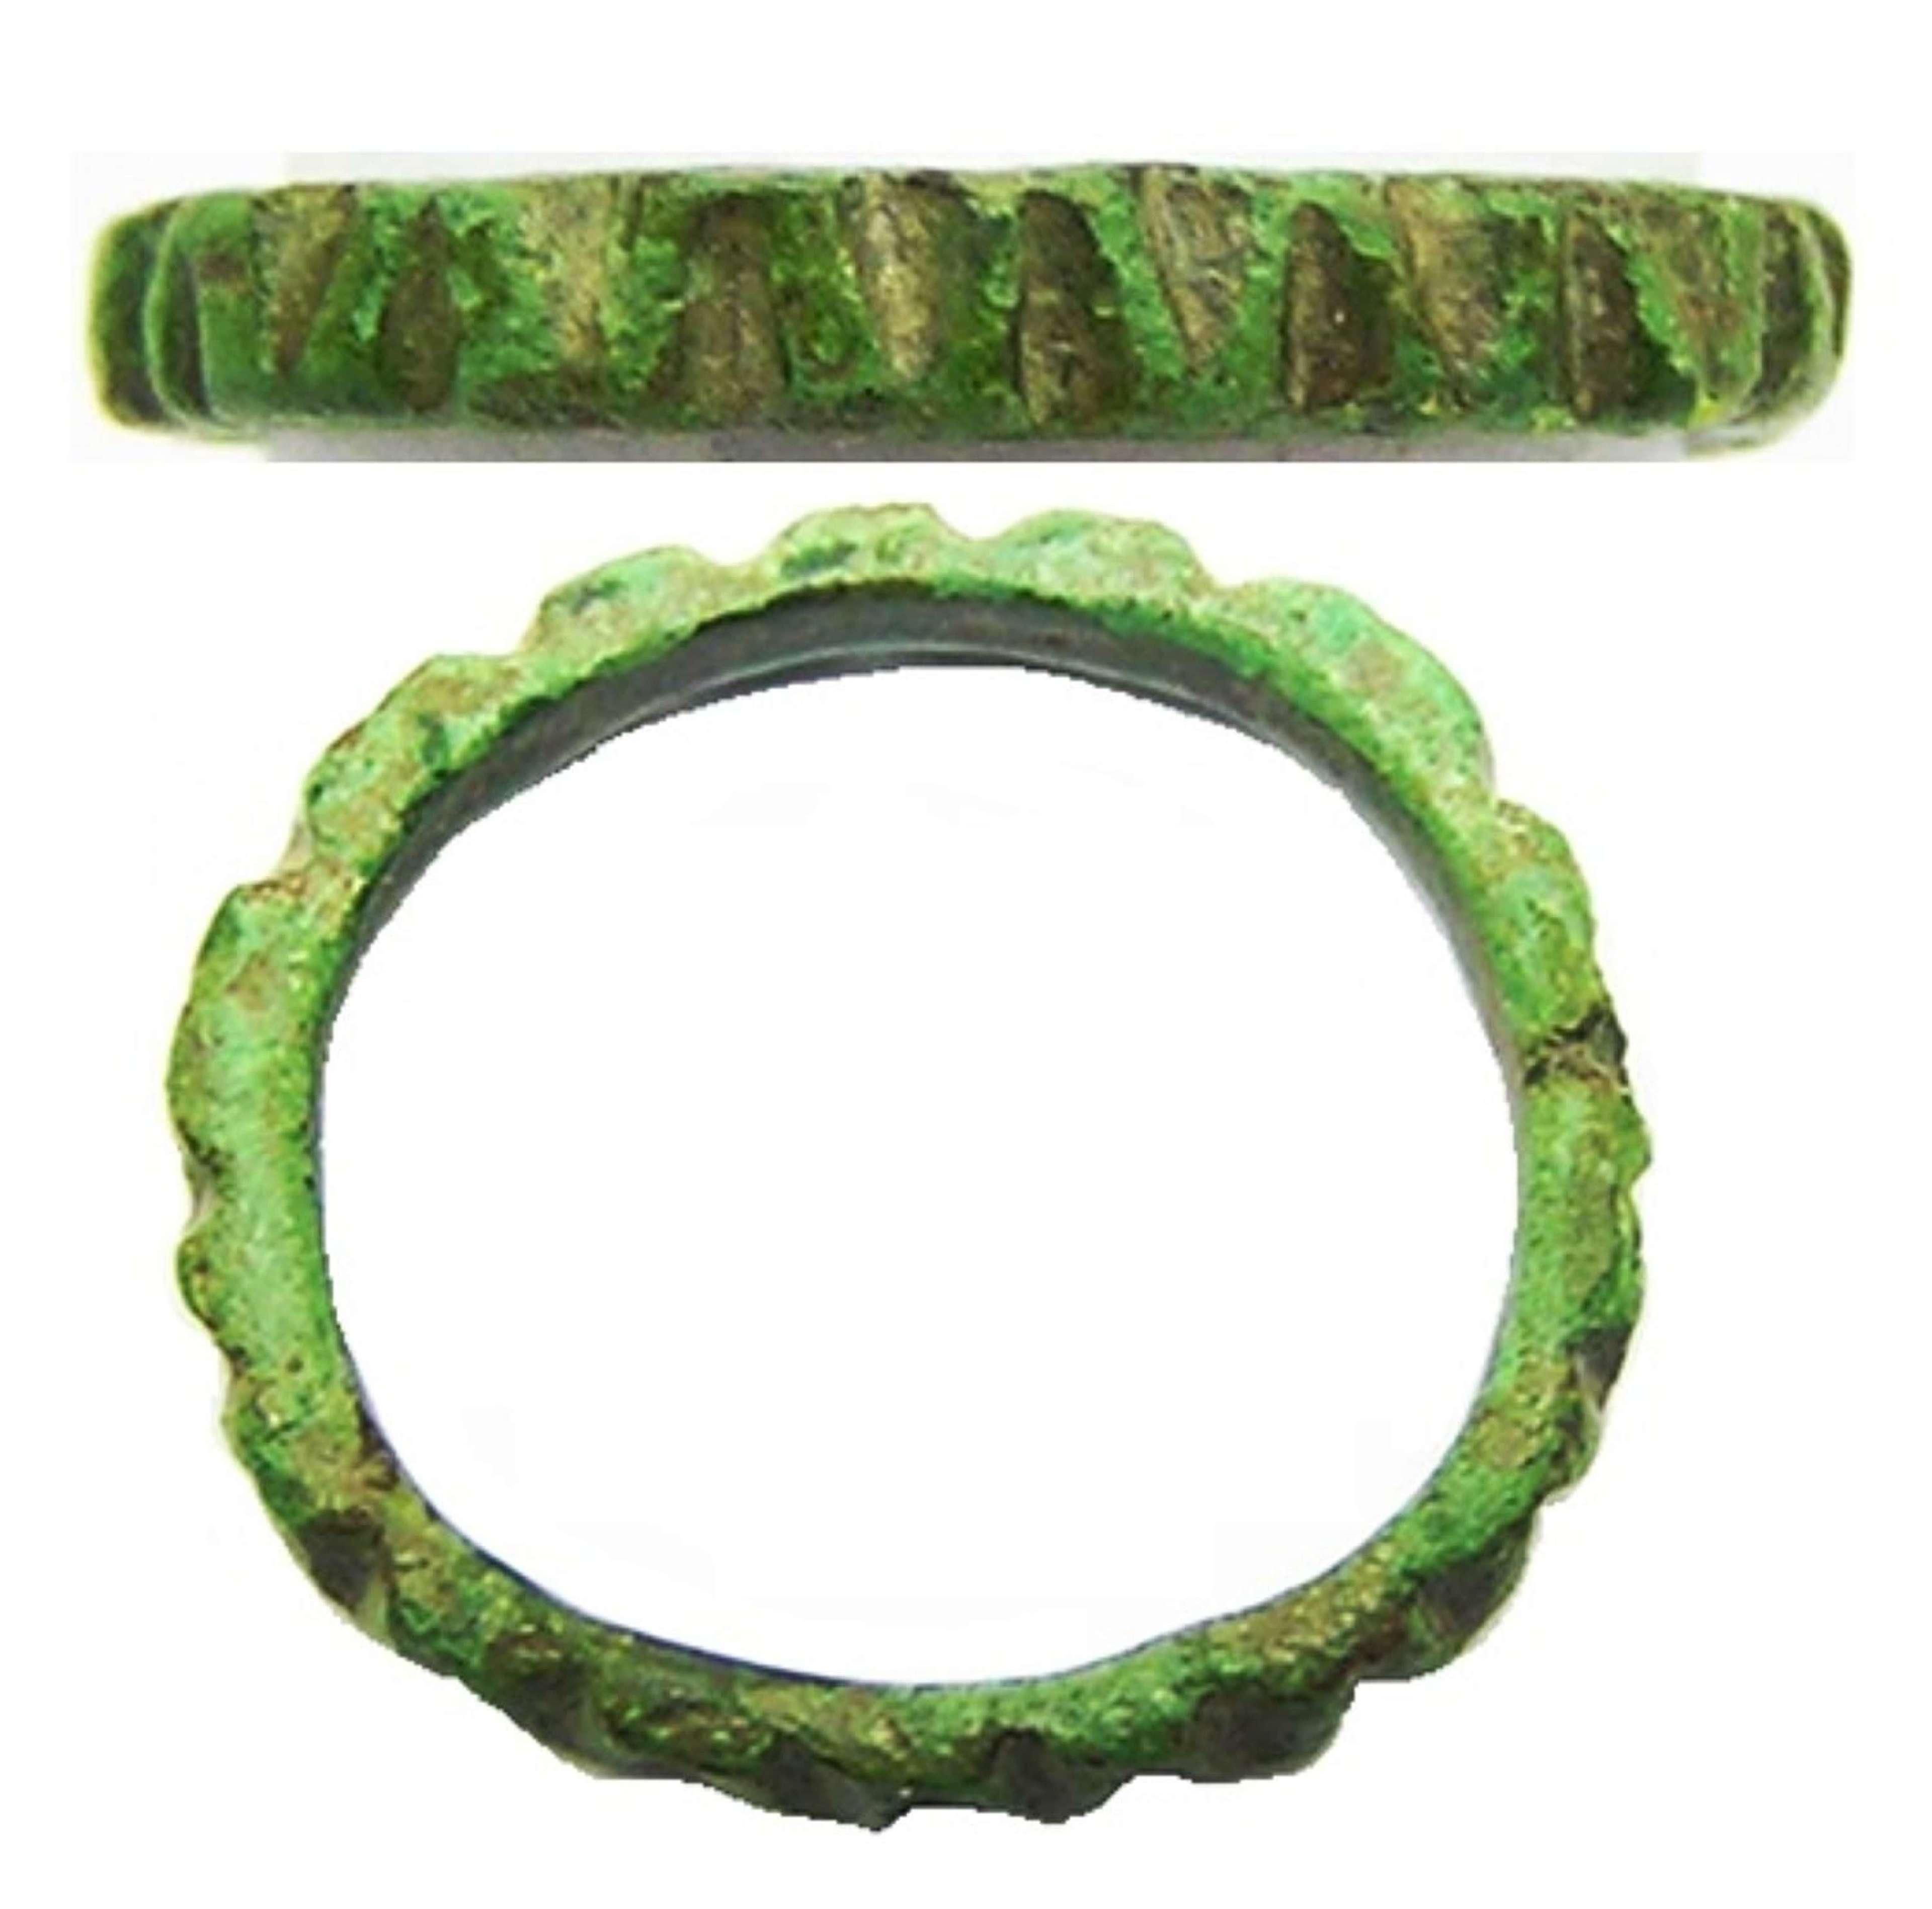 Ancient Roman bronze finger ring 'angular wave' design